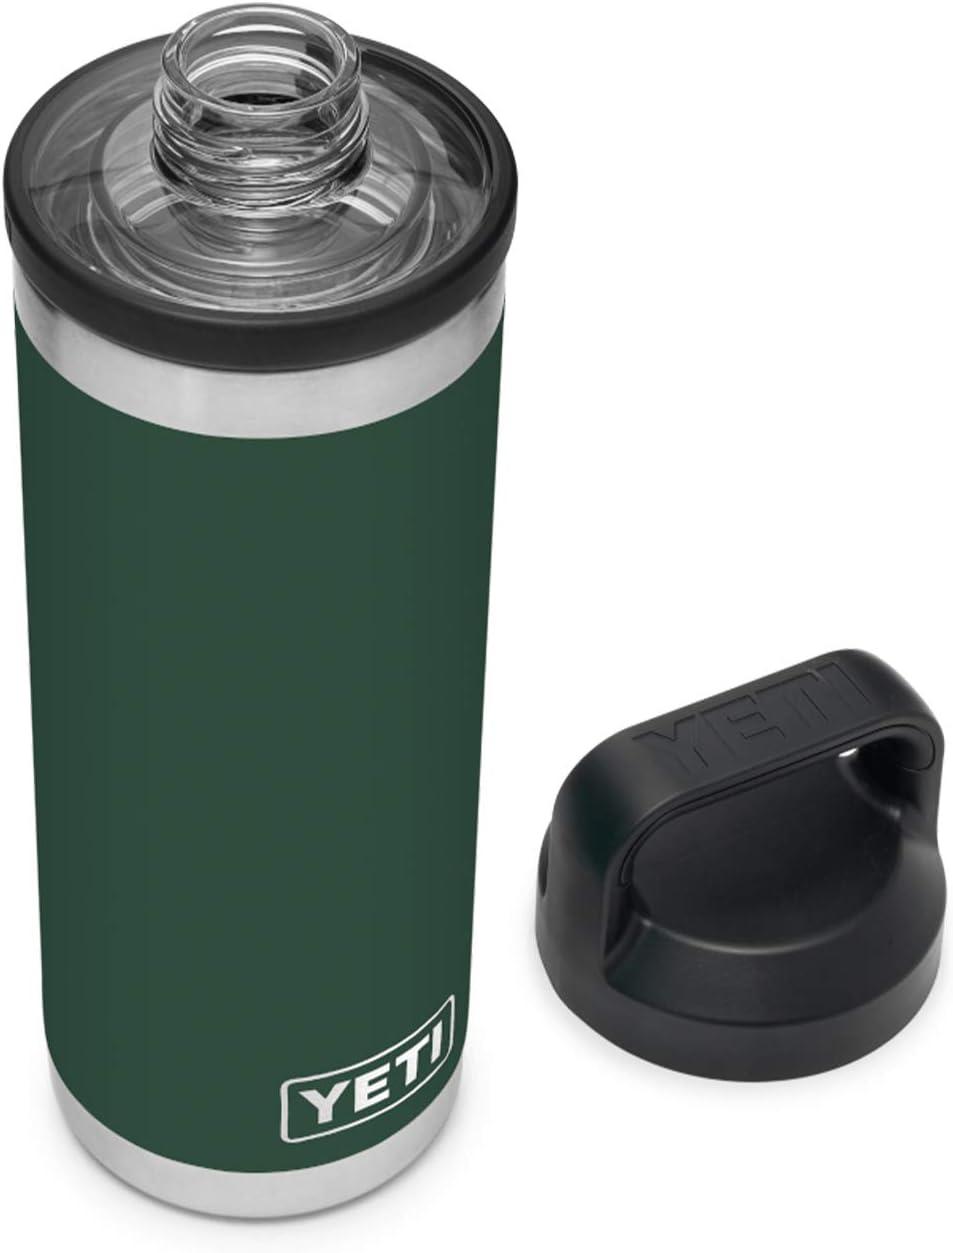 YETI Rambler 18 oz Bottle, Vacuum Insulated, Stainless Steel with Chug Cap